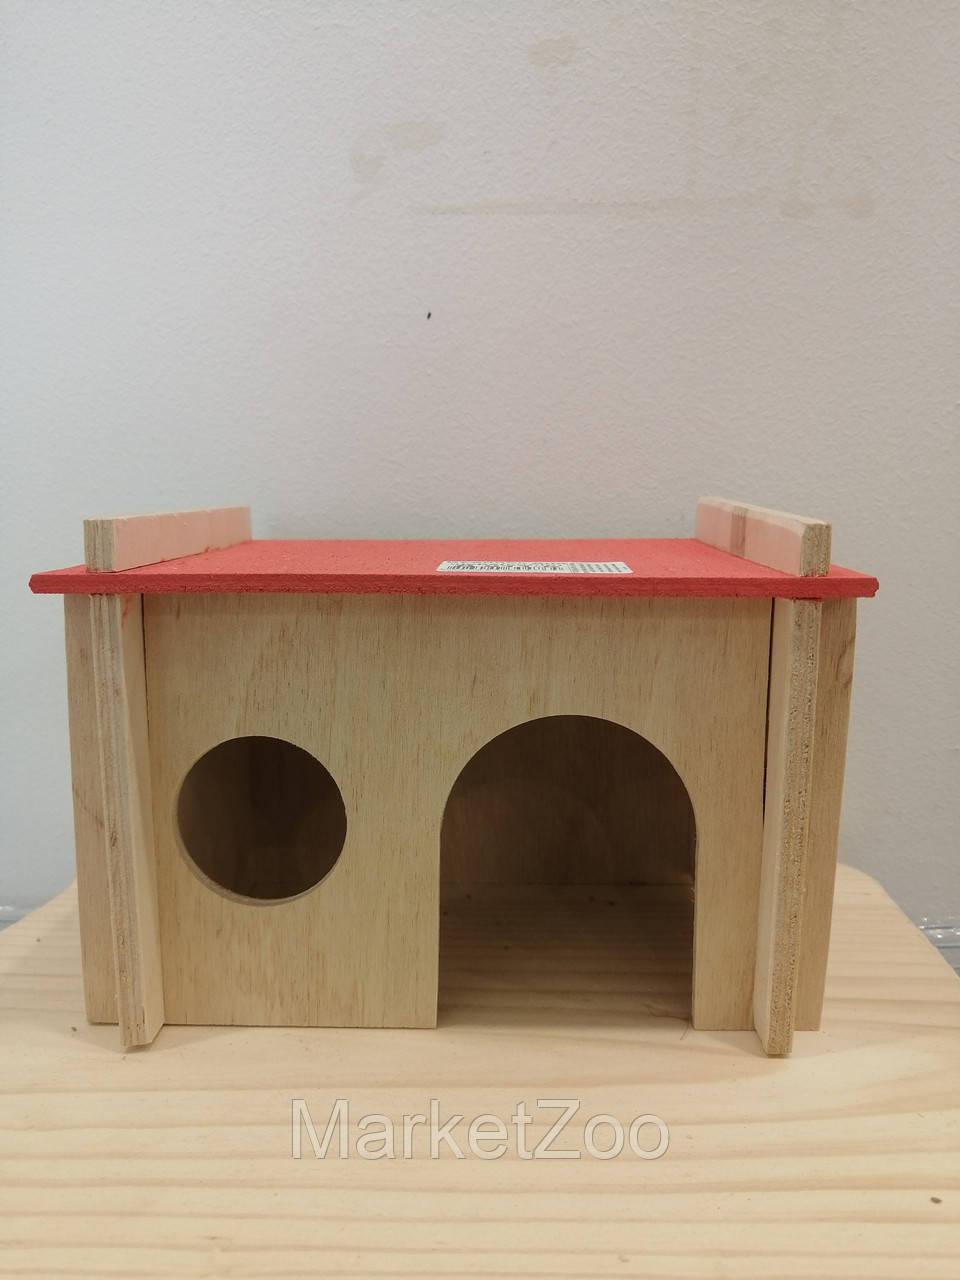 Домик для маленькой крысы,хомяка,дегу